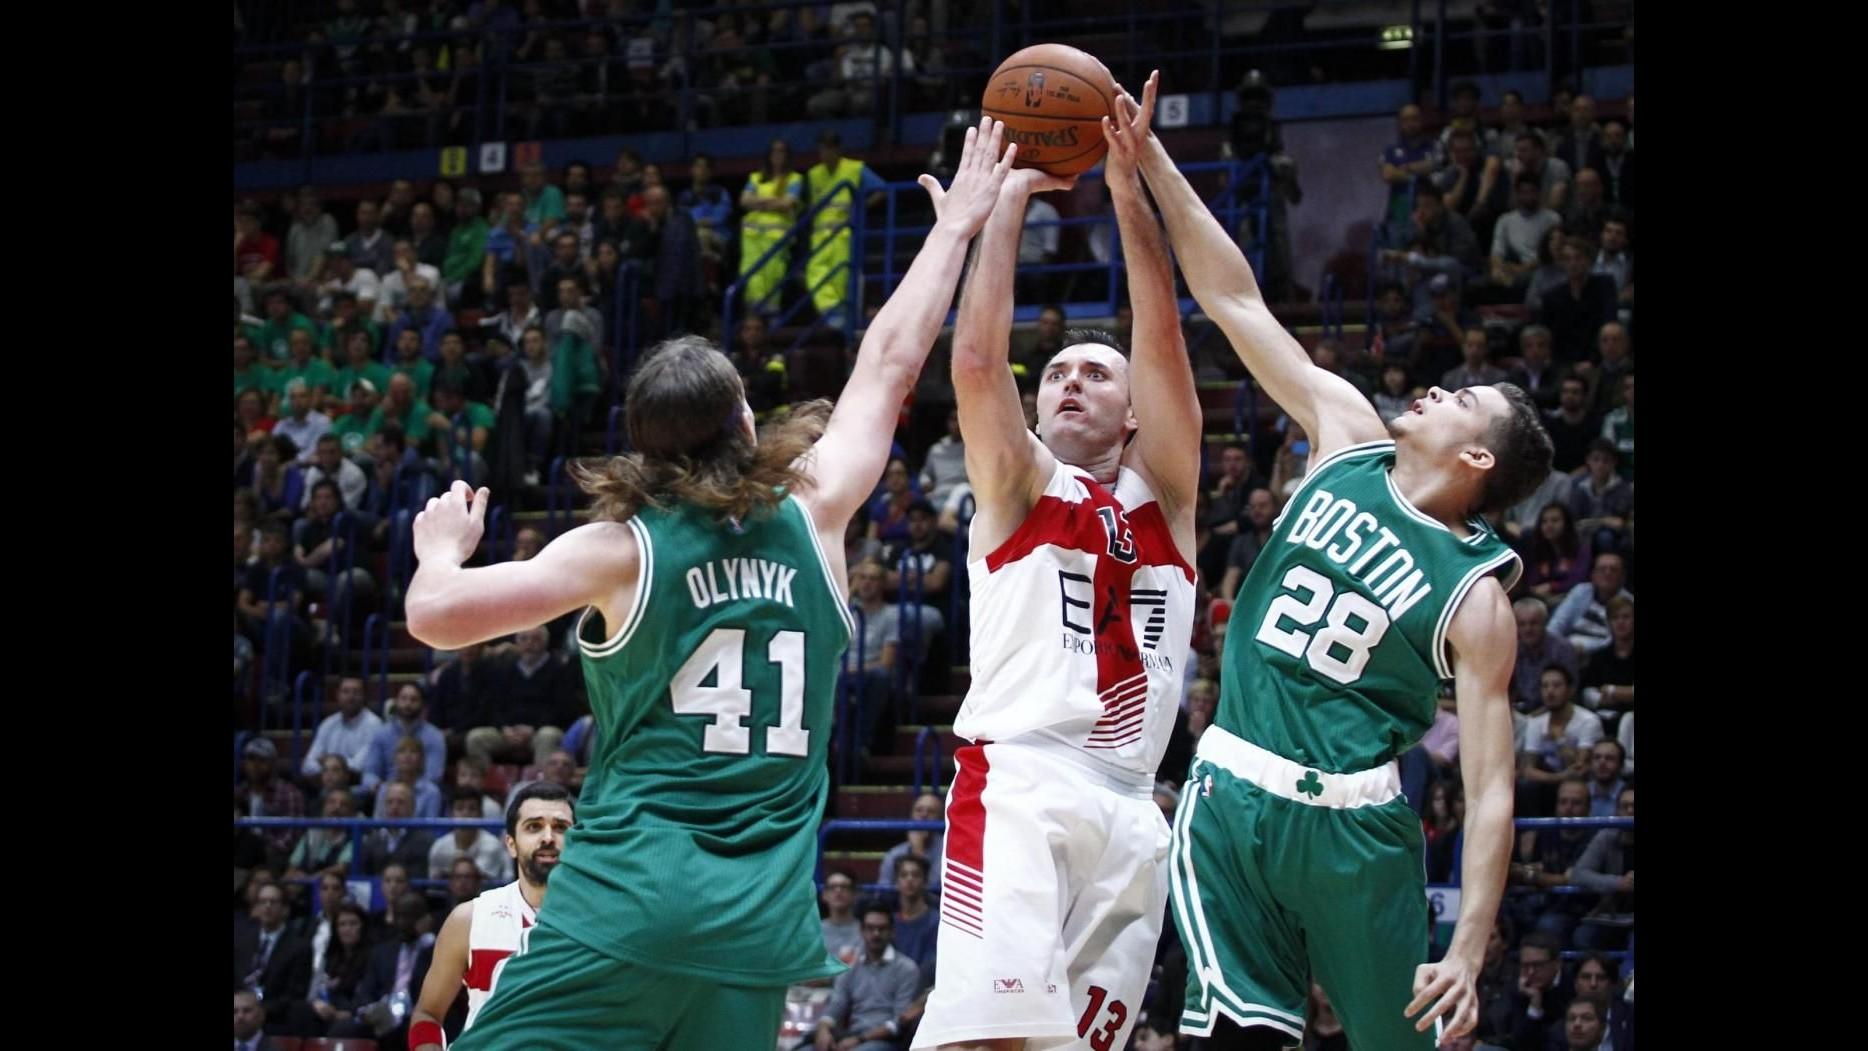 Basket, festa a Milano per star Nba: Boston travolge l'Olimpia